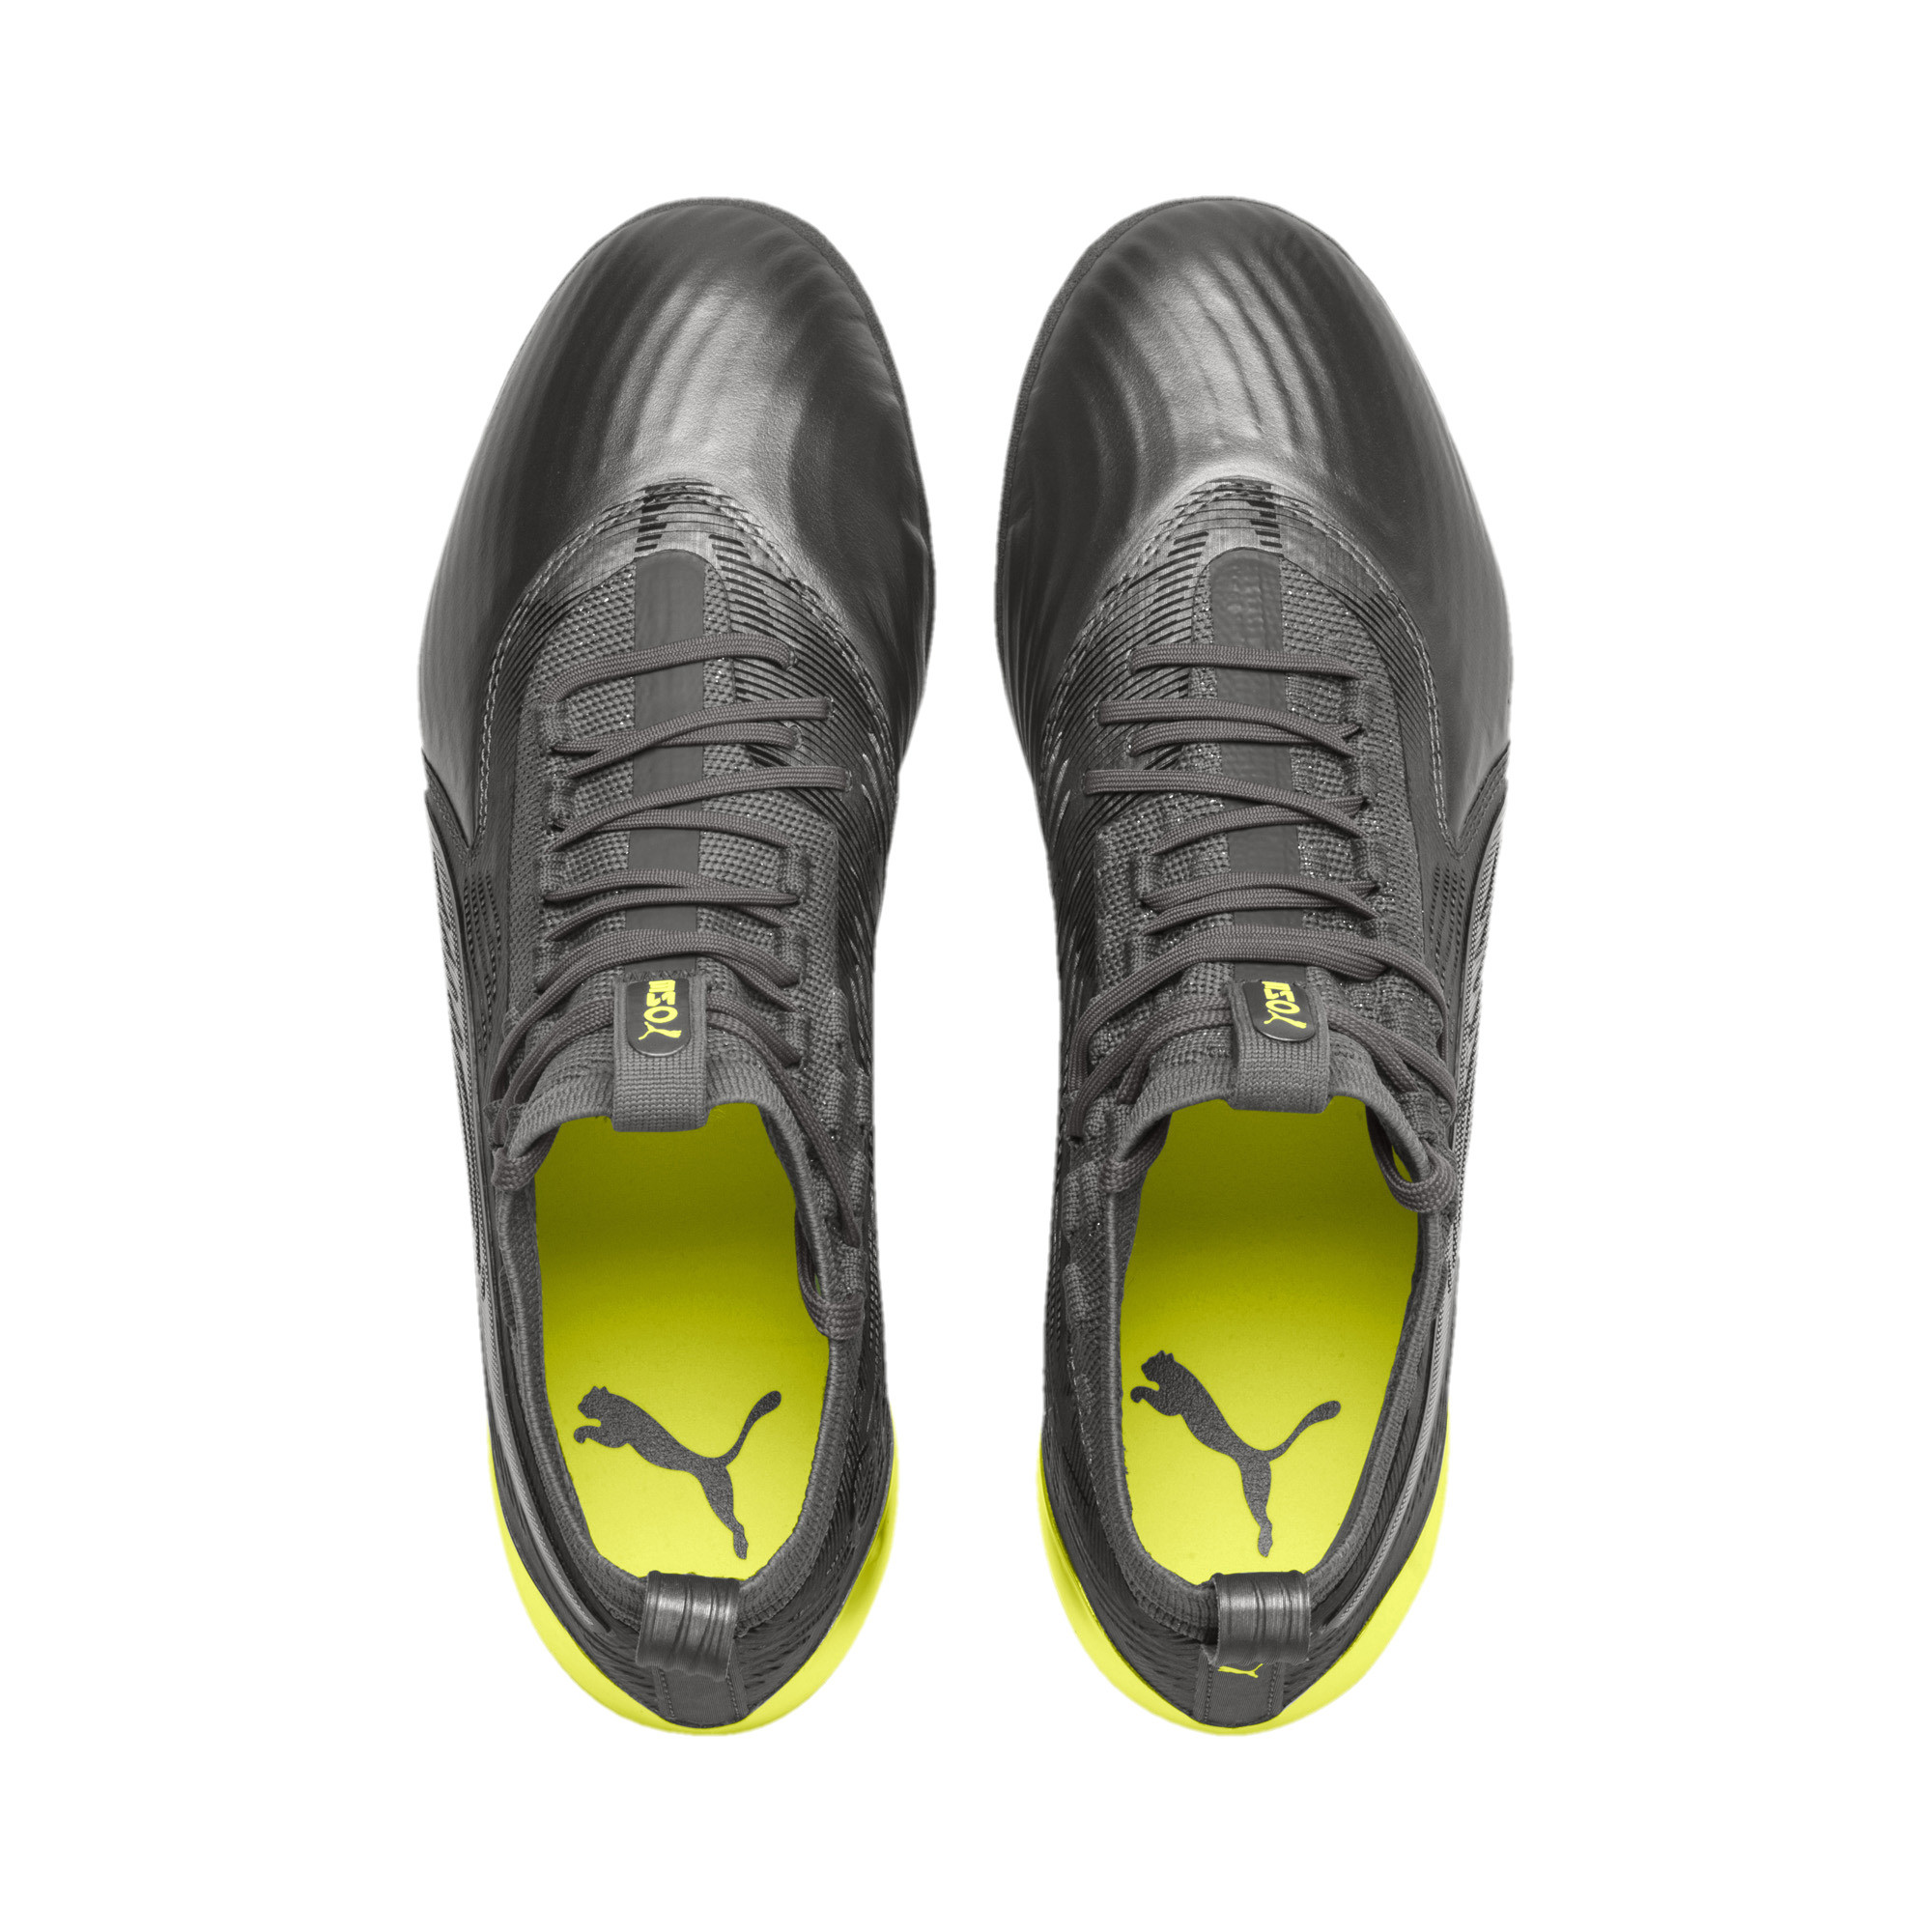 Image Puma PUMA ONE 19.1 Limited Edition FG/AG Men's Football Boots #6